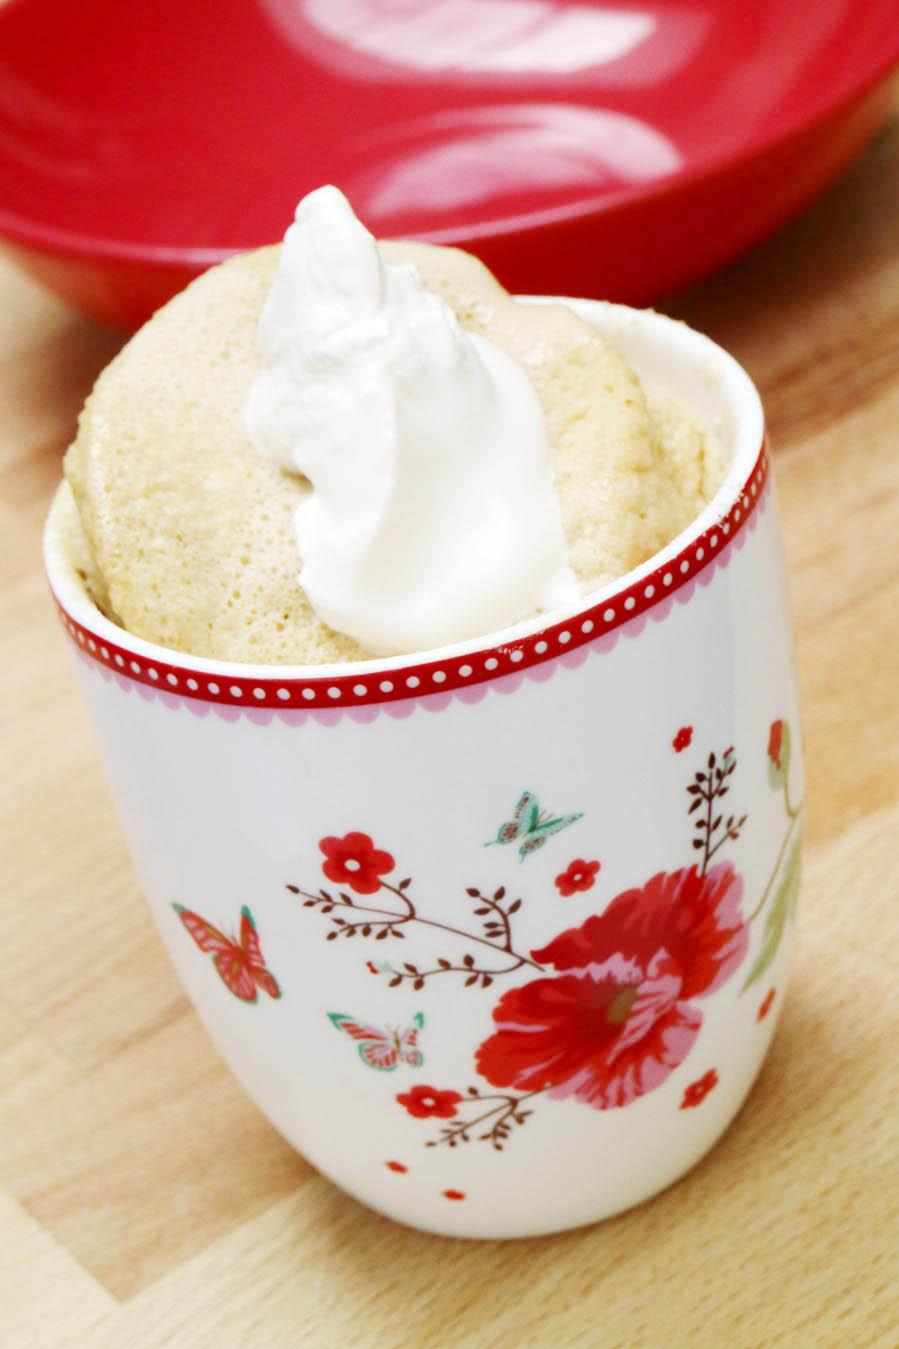 Recept voor keto mug cake - AllinMam.com